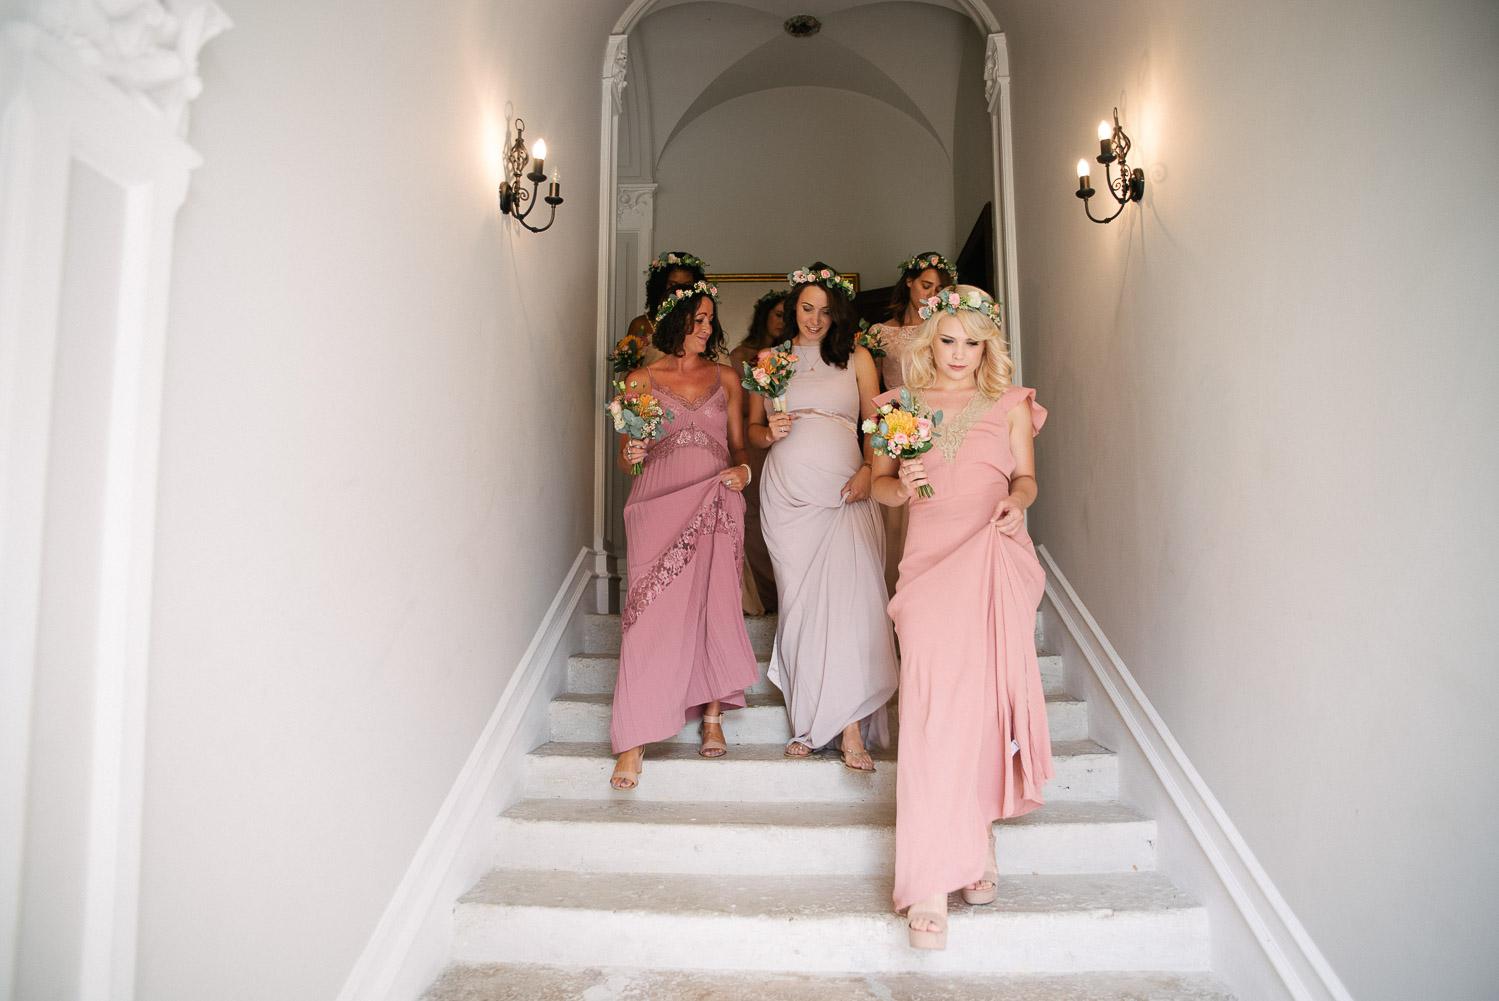 chateau_de_lisse_gers_wedding_katy_webb_photography_france_UK38